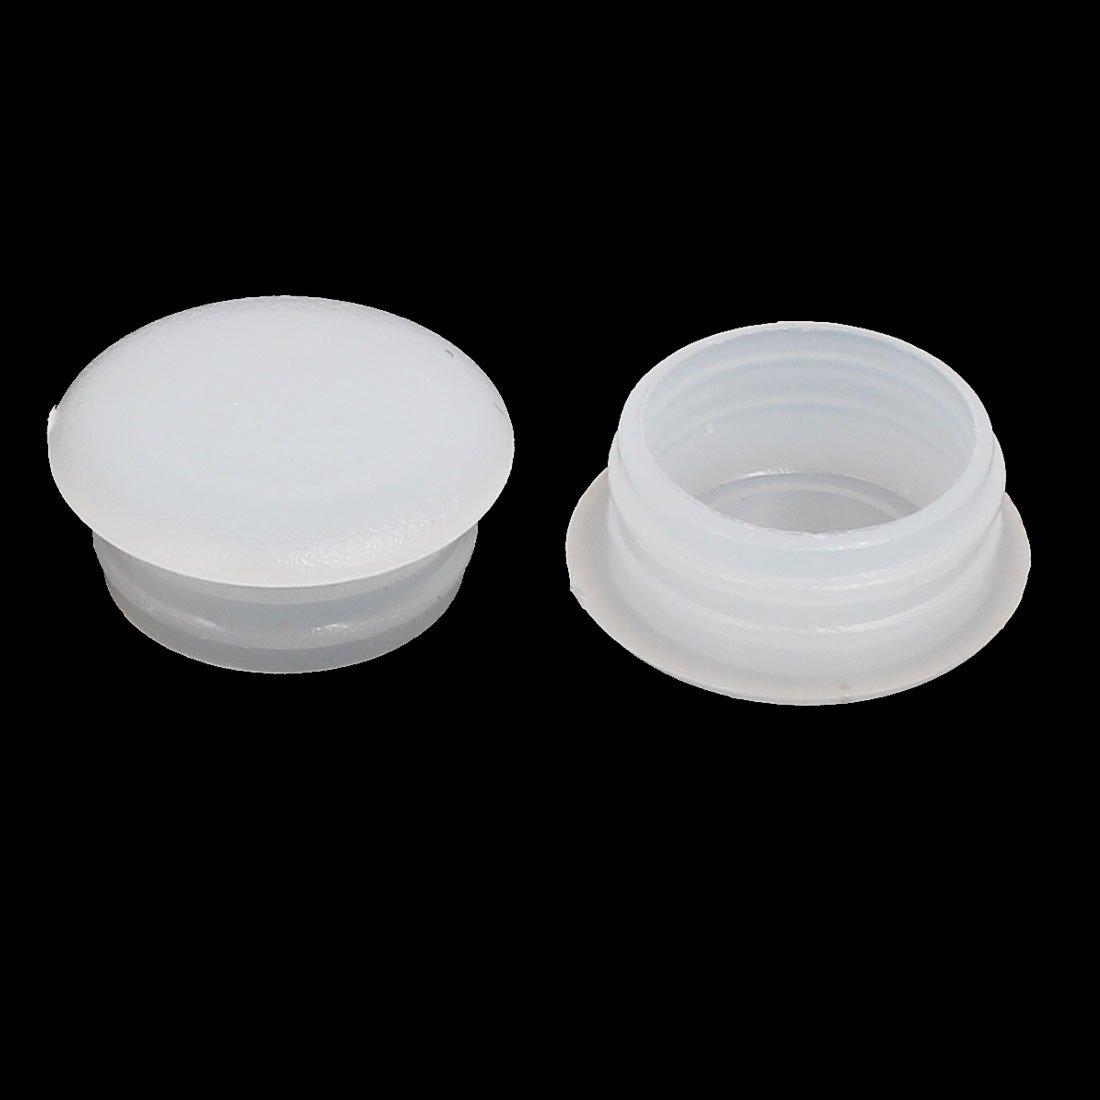 15mm Dia Plastic Thread Design Screw Cap Covers Hole Lids Brown 30pcs